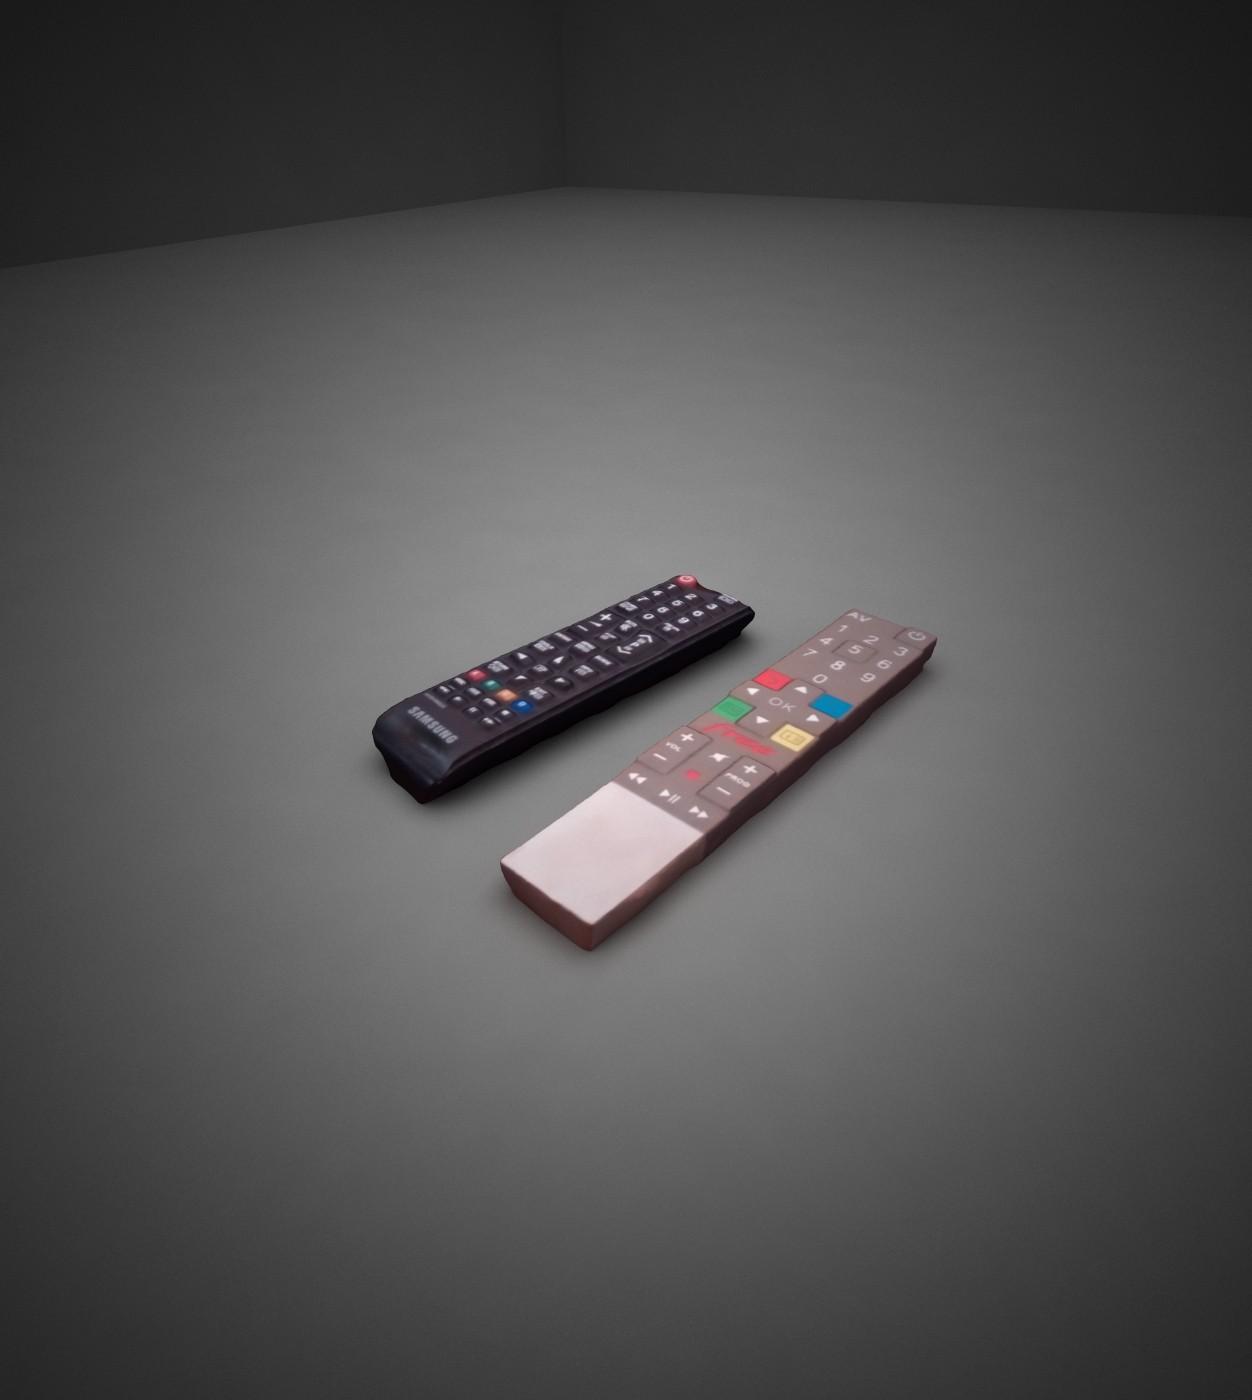 remote kontrol4.jpg